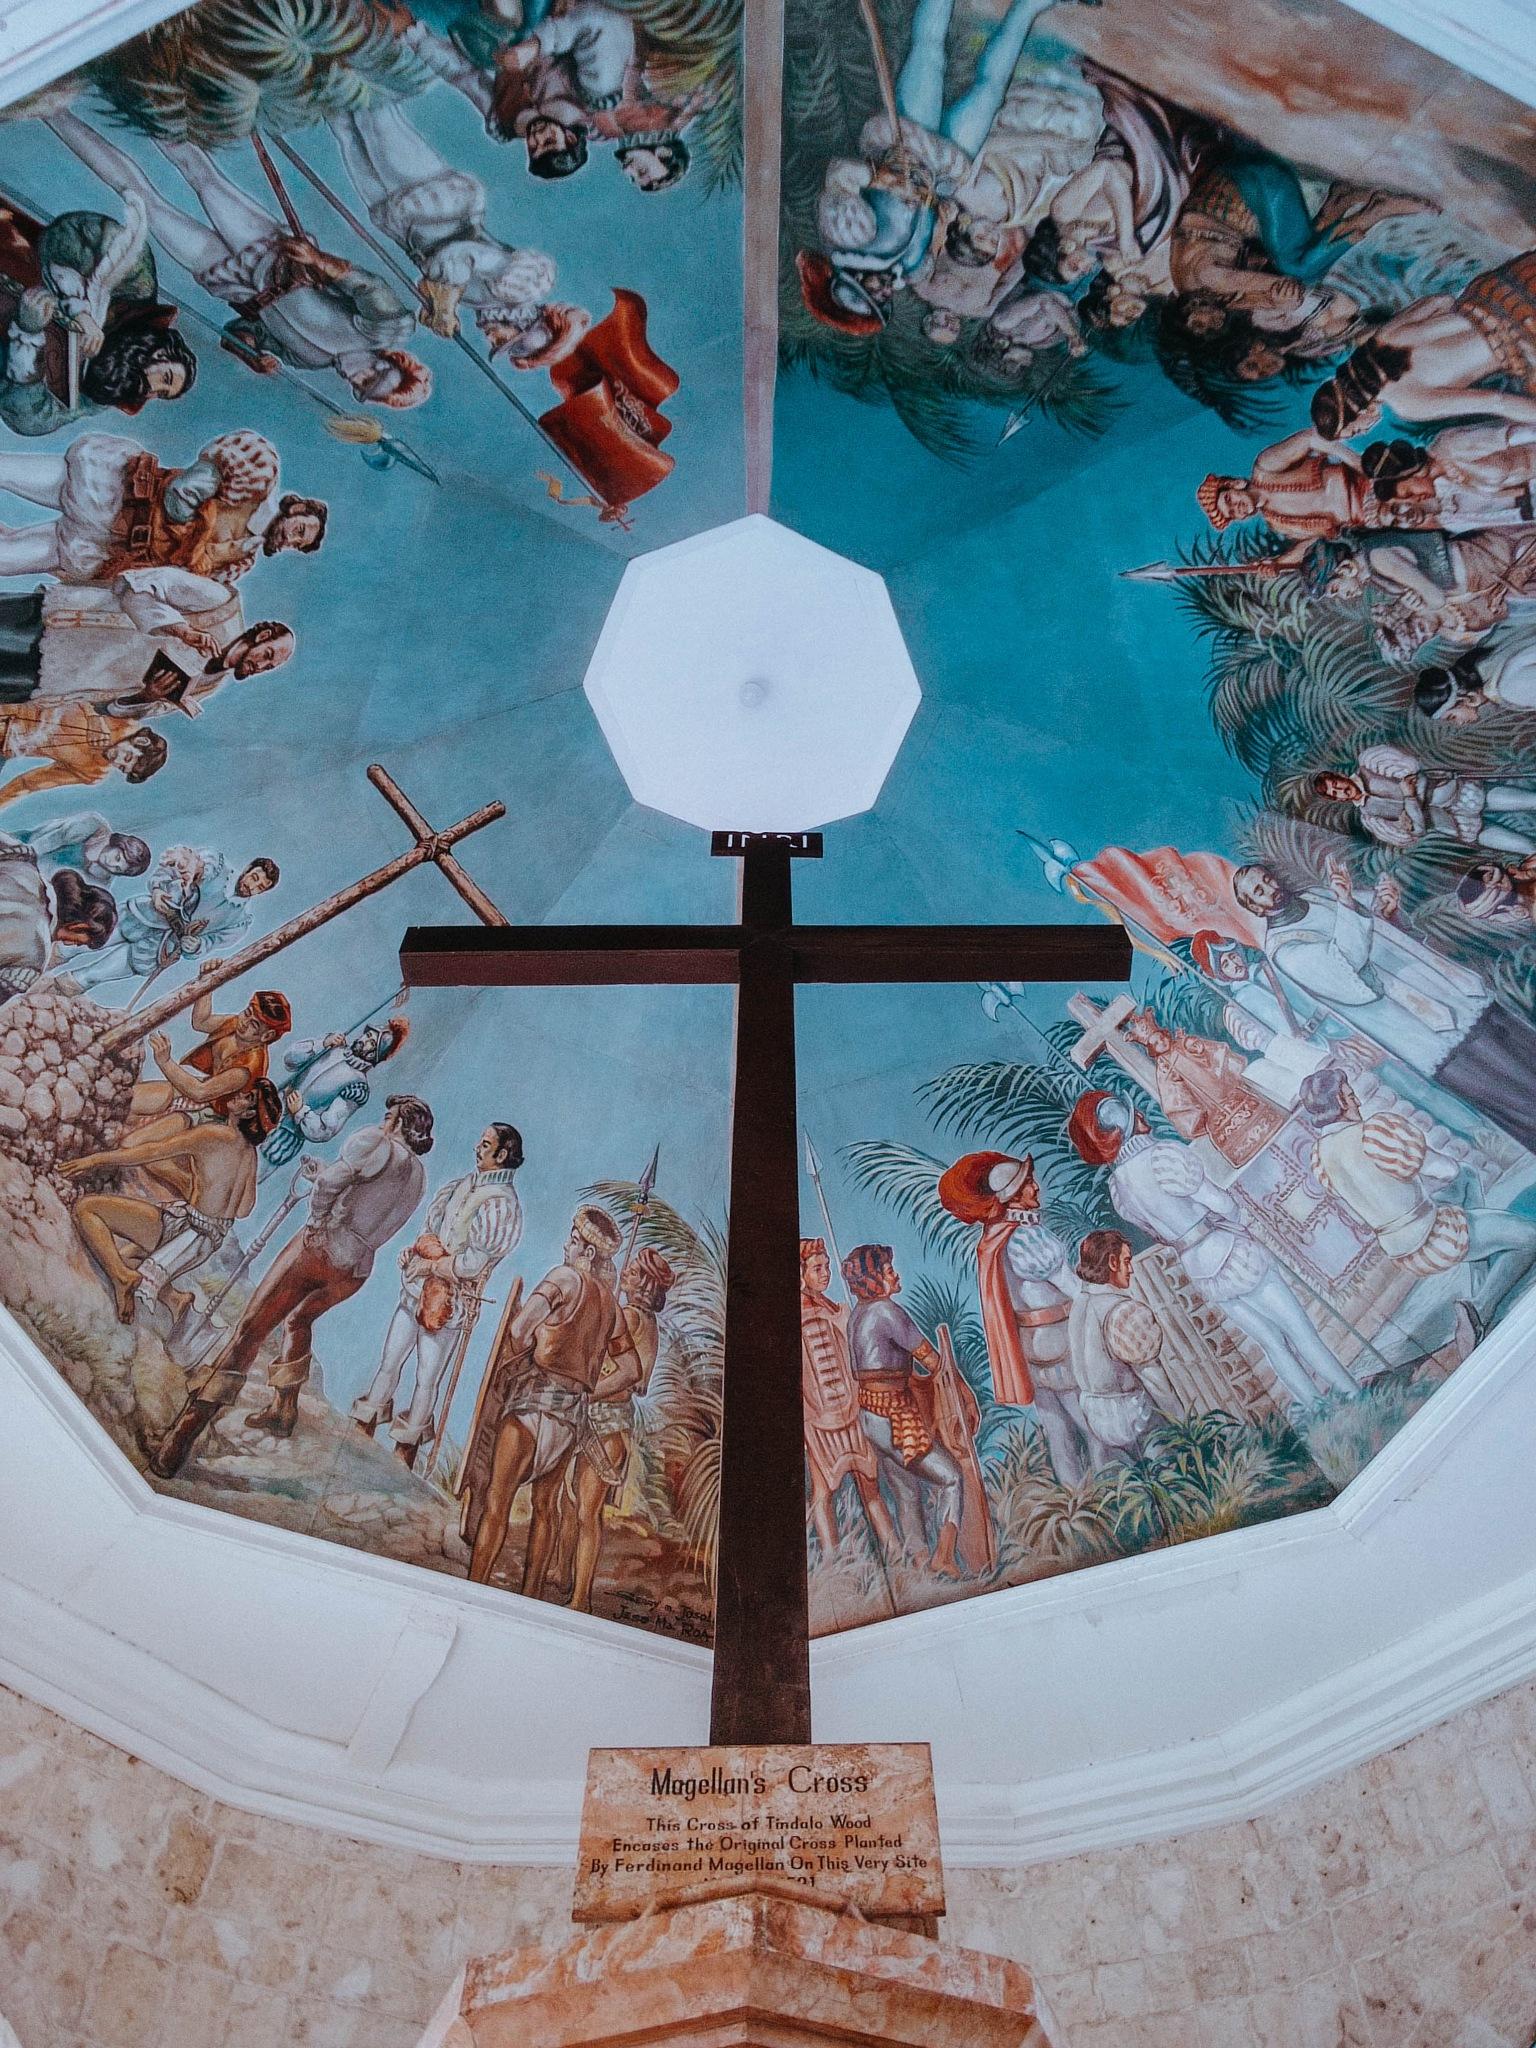 Magellan's Cross by Mark Angelo Macaspac